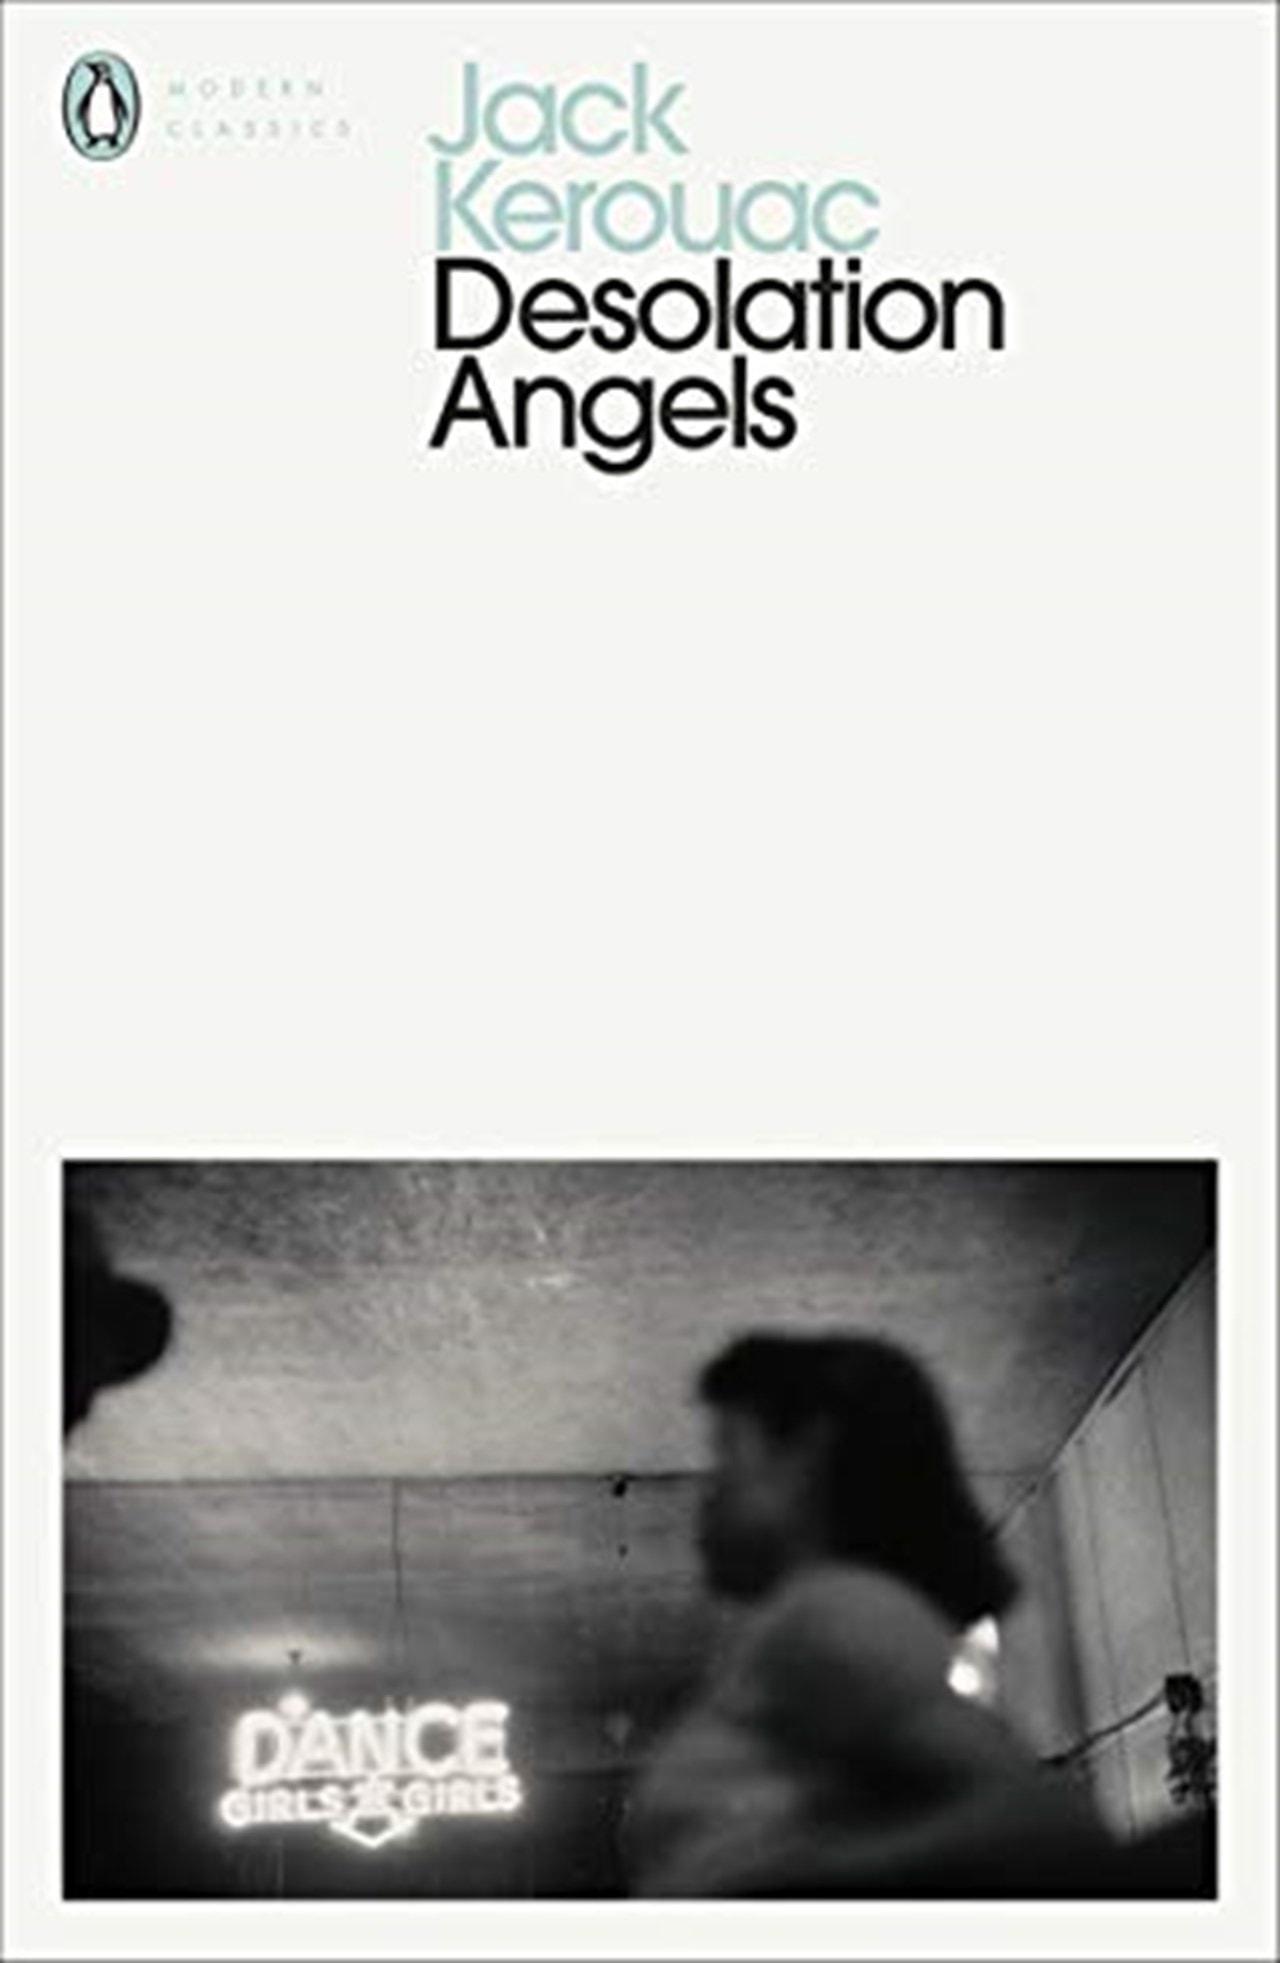 Desolation Angels - 1